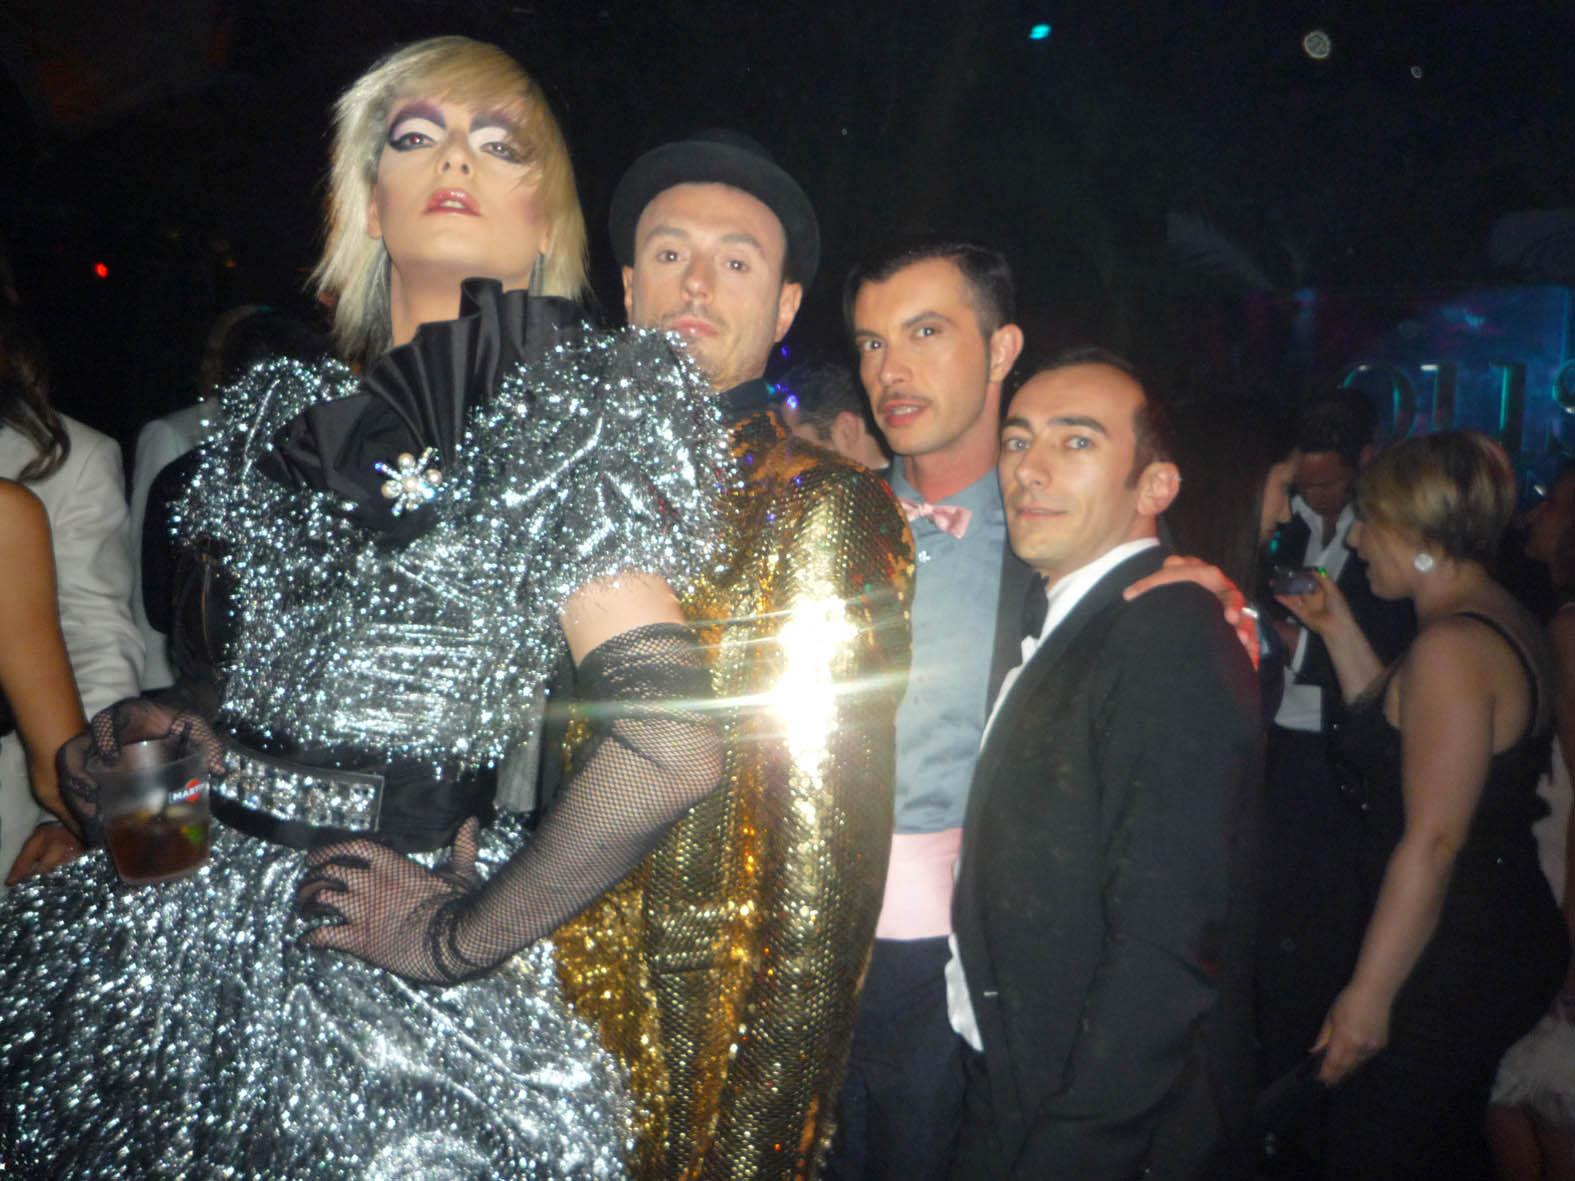 La Stryxia, Sergio Tavelli, Luca Crescenzi e Gigi Mandara a Cannes al party di D&G